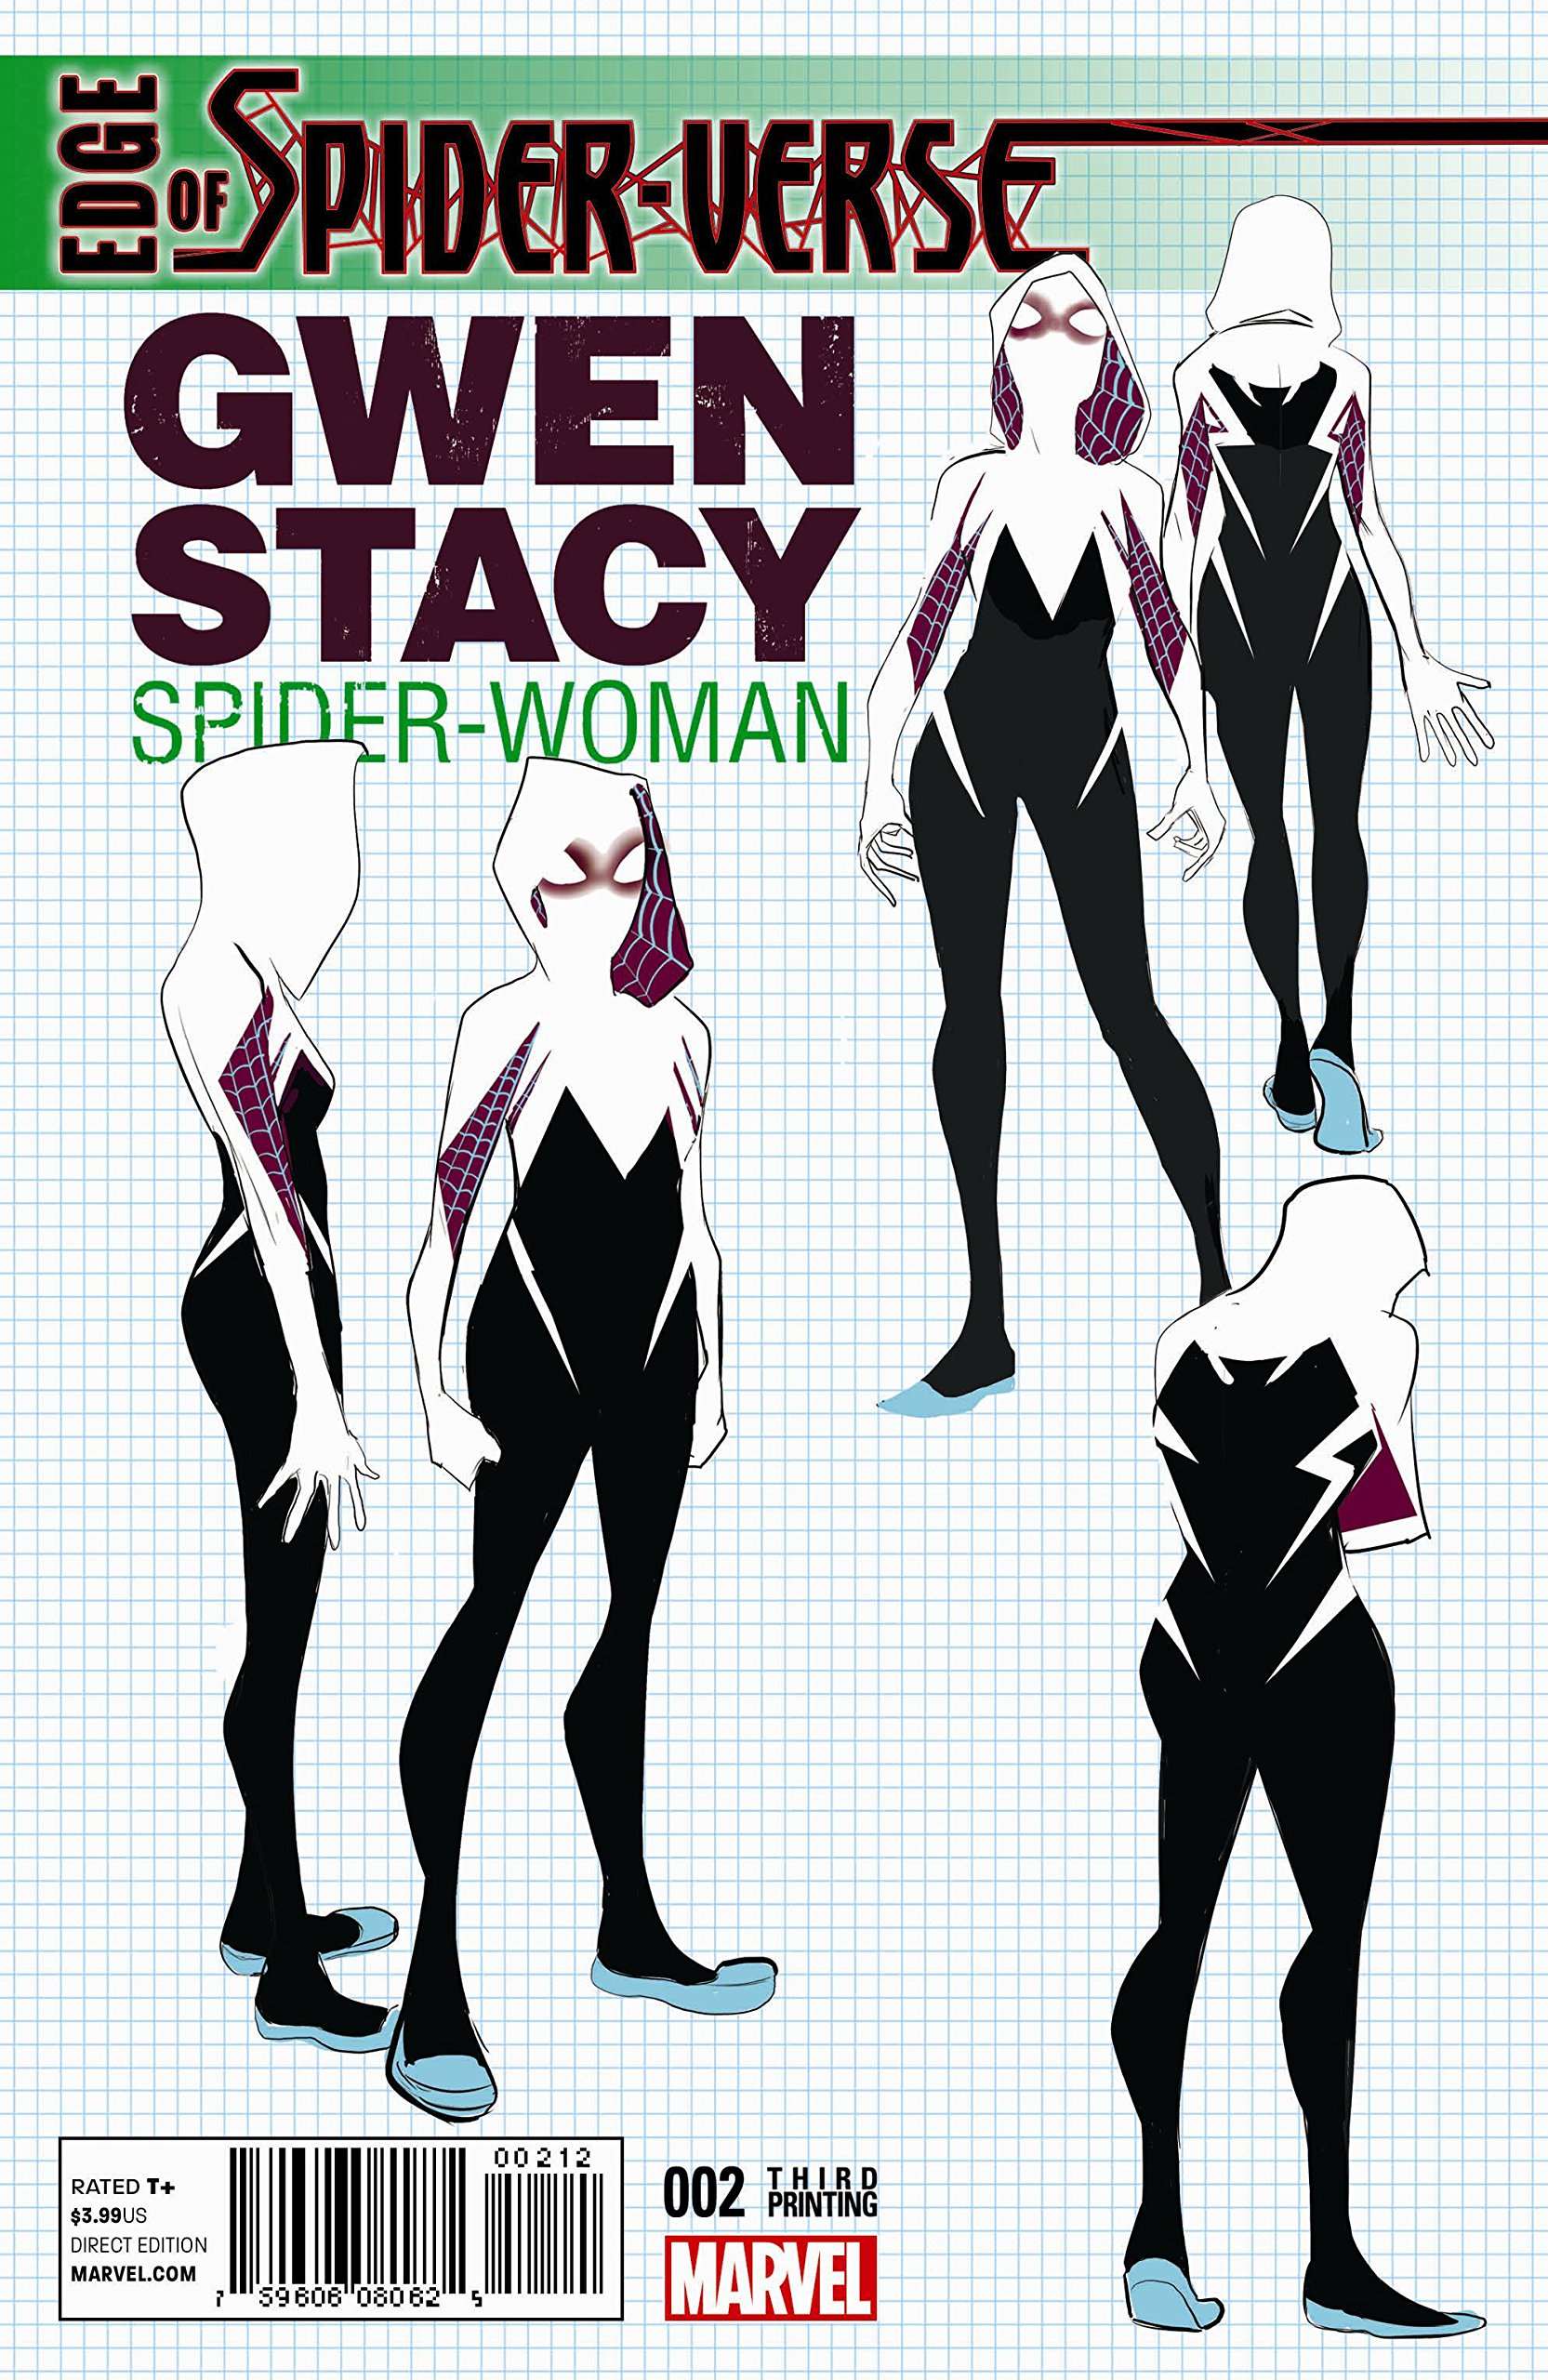 Edge of Spider-Verse #2 3rd Print Design Variant Gwen Stacy